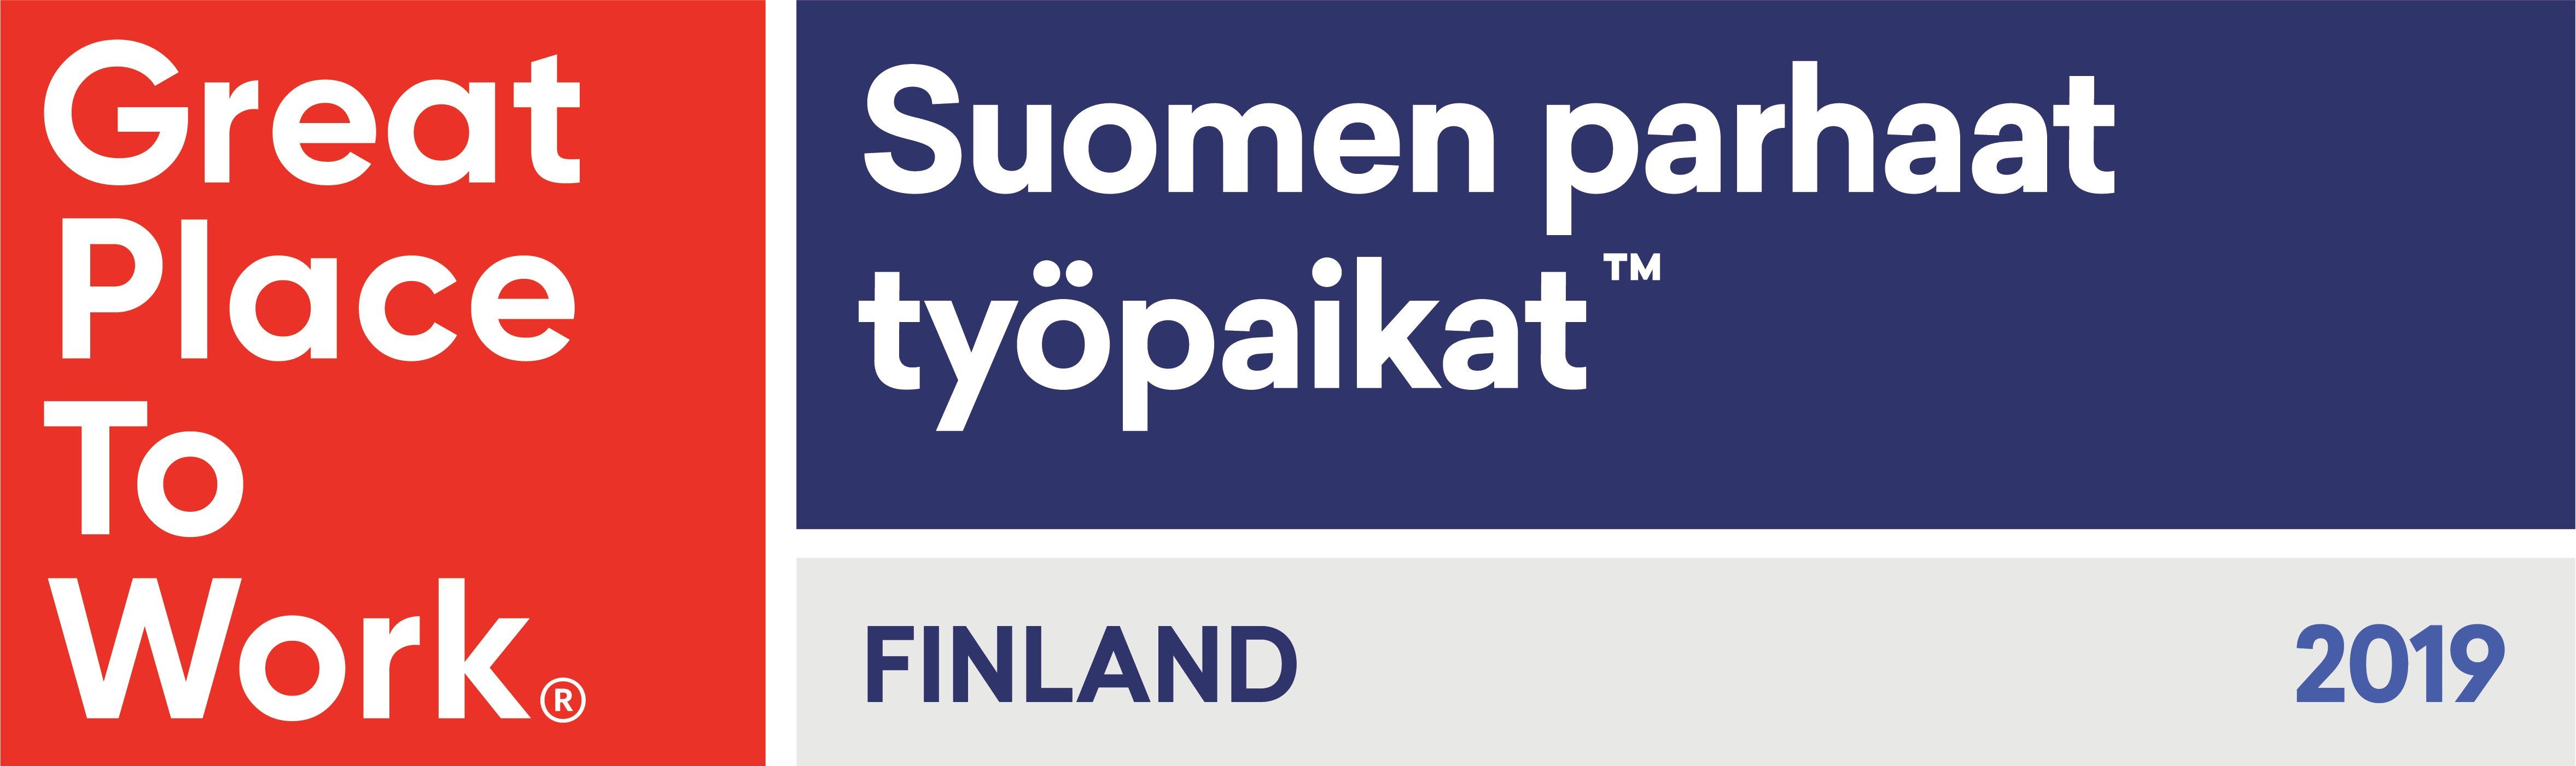 Suomen parhaat työpaikat GPTW